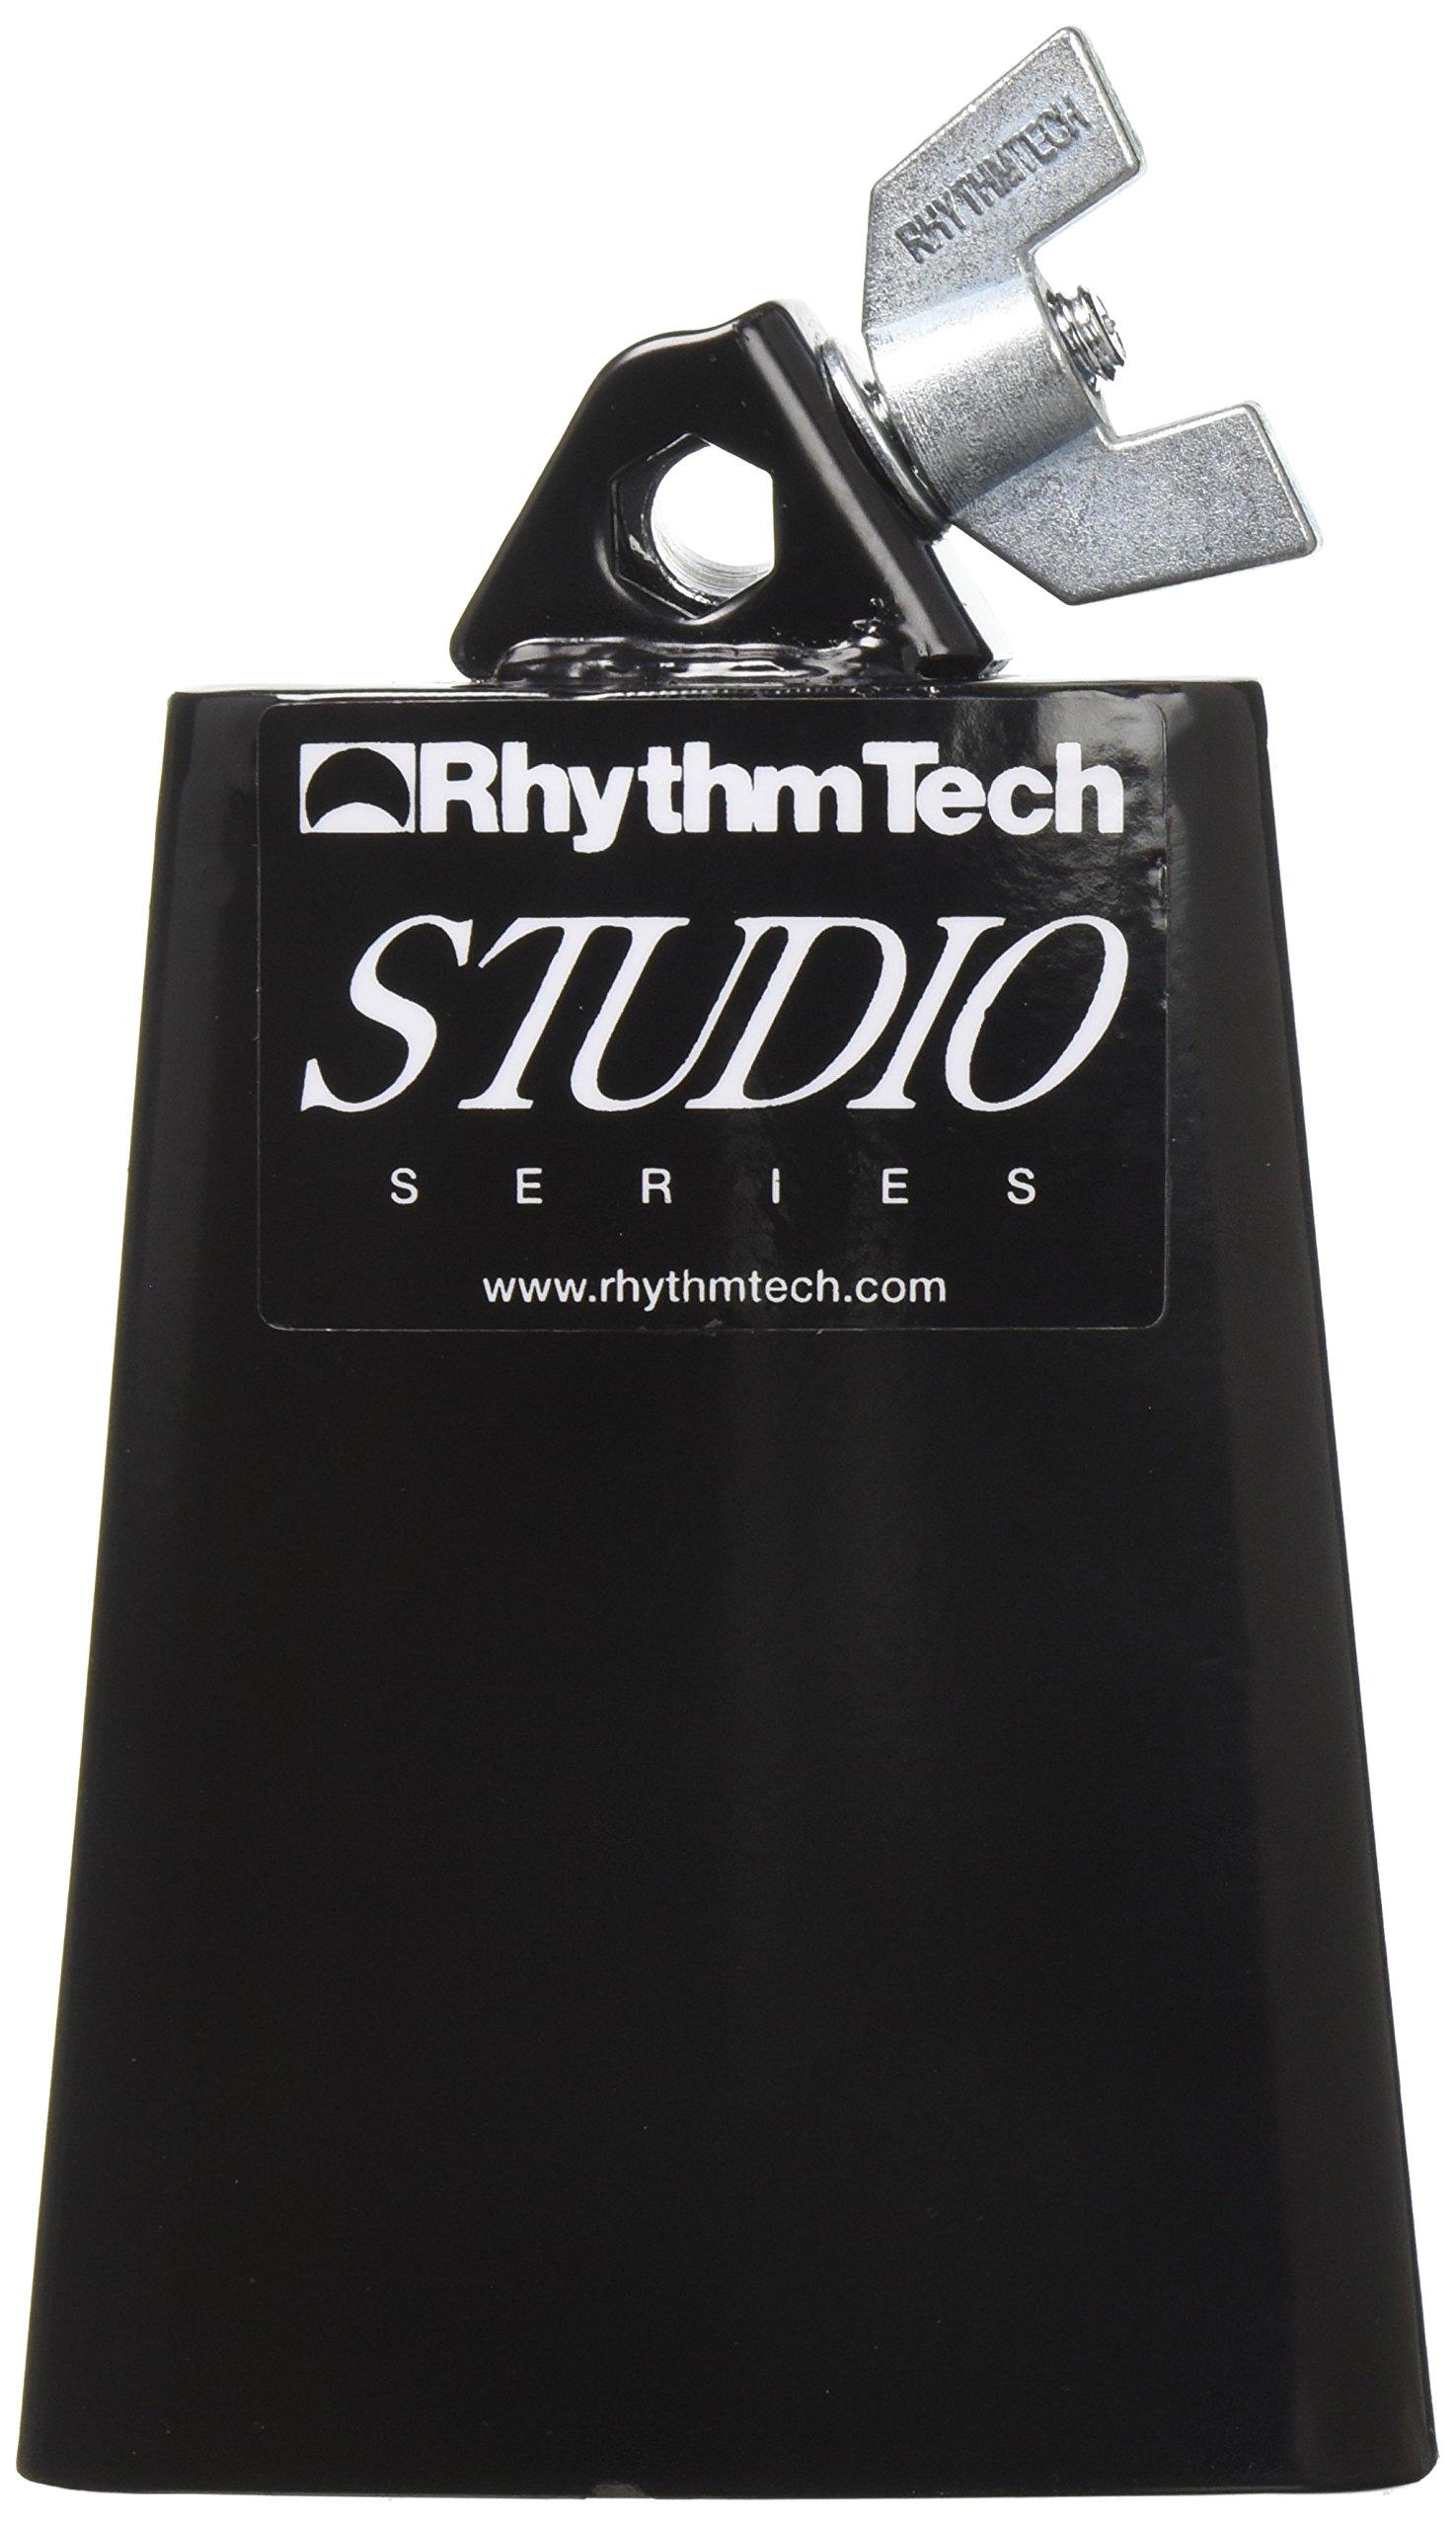 Rhythm Tech RT 3005 M 5 Inch Studio Series Cowbell + DSM2 Mount by Rhythm Tech